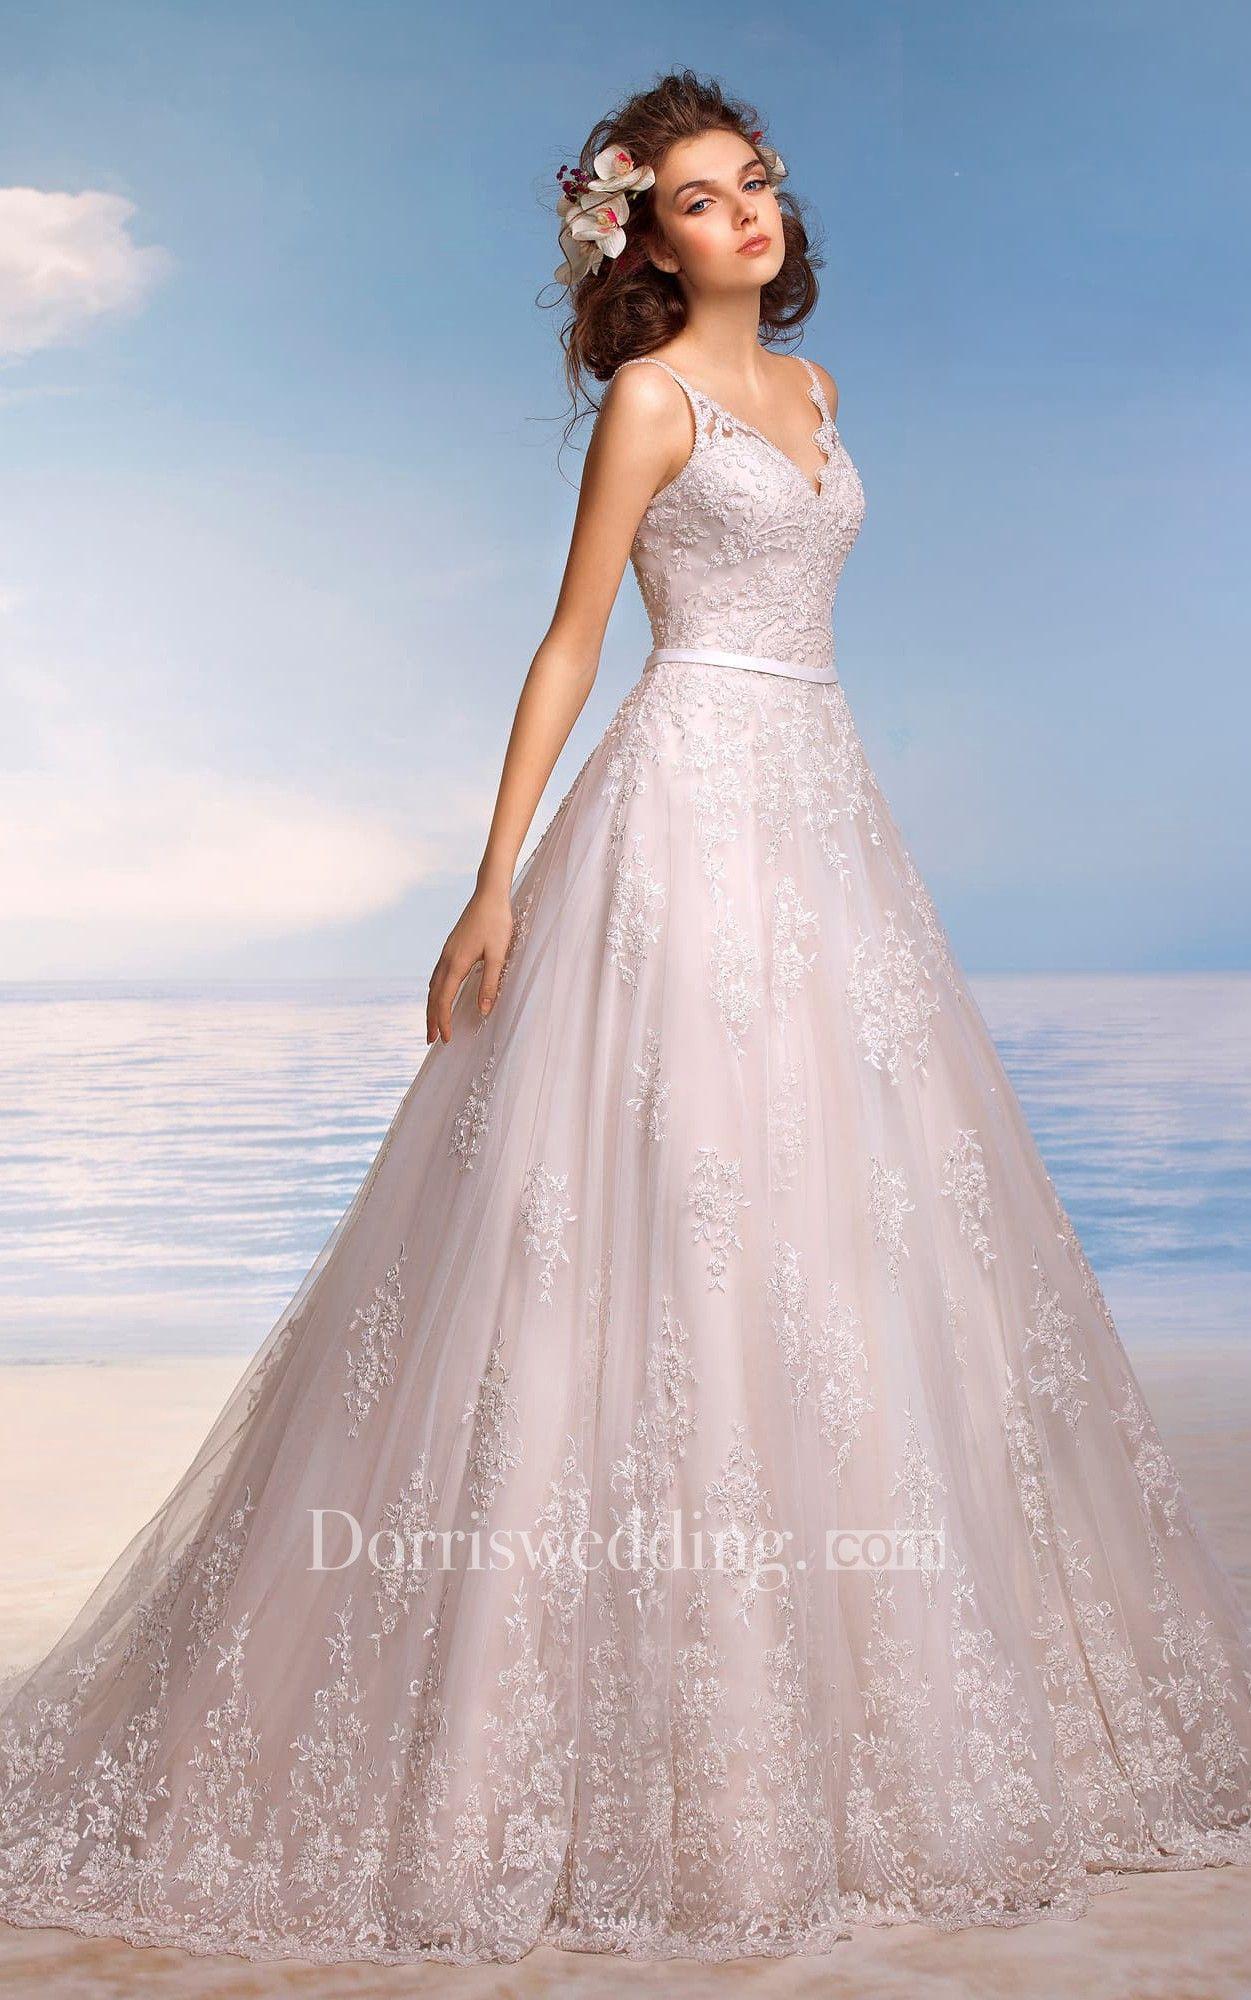 High Neck Sleeveless Long Pleats Satin Tulle Dress